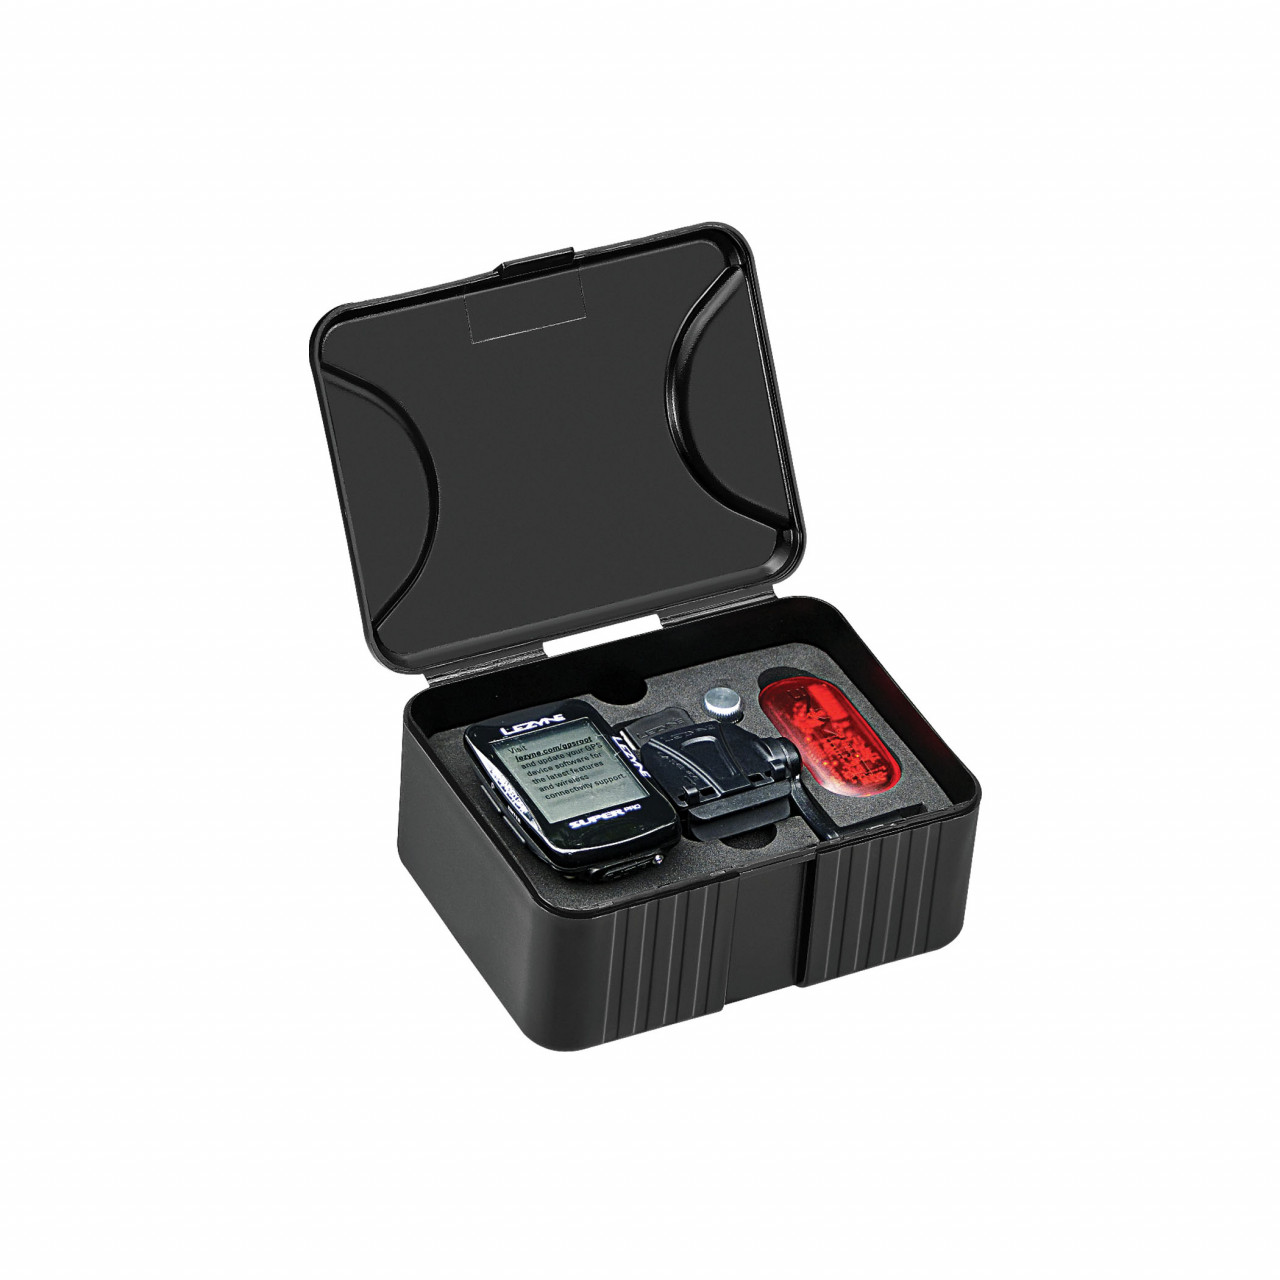 Lezyne cyklocomputer SUPER PRO GPS HR/ProSC LOADED